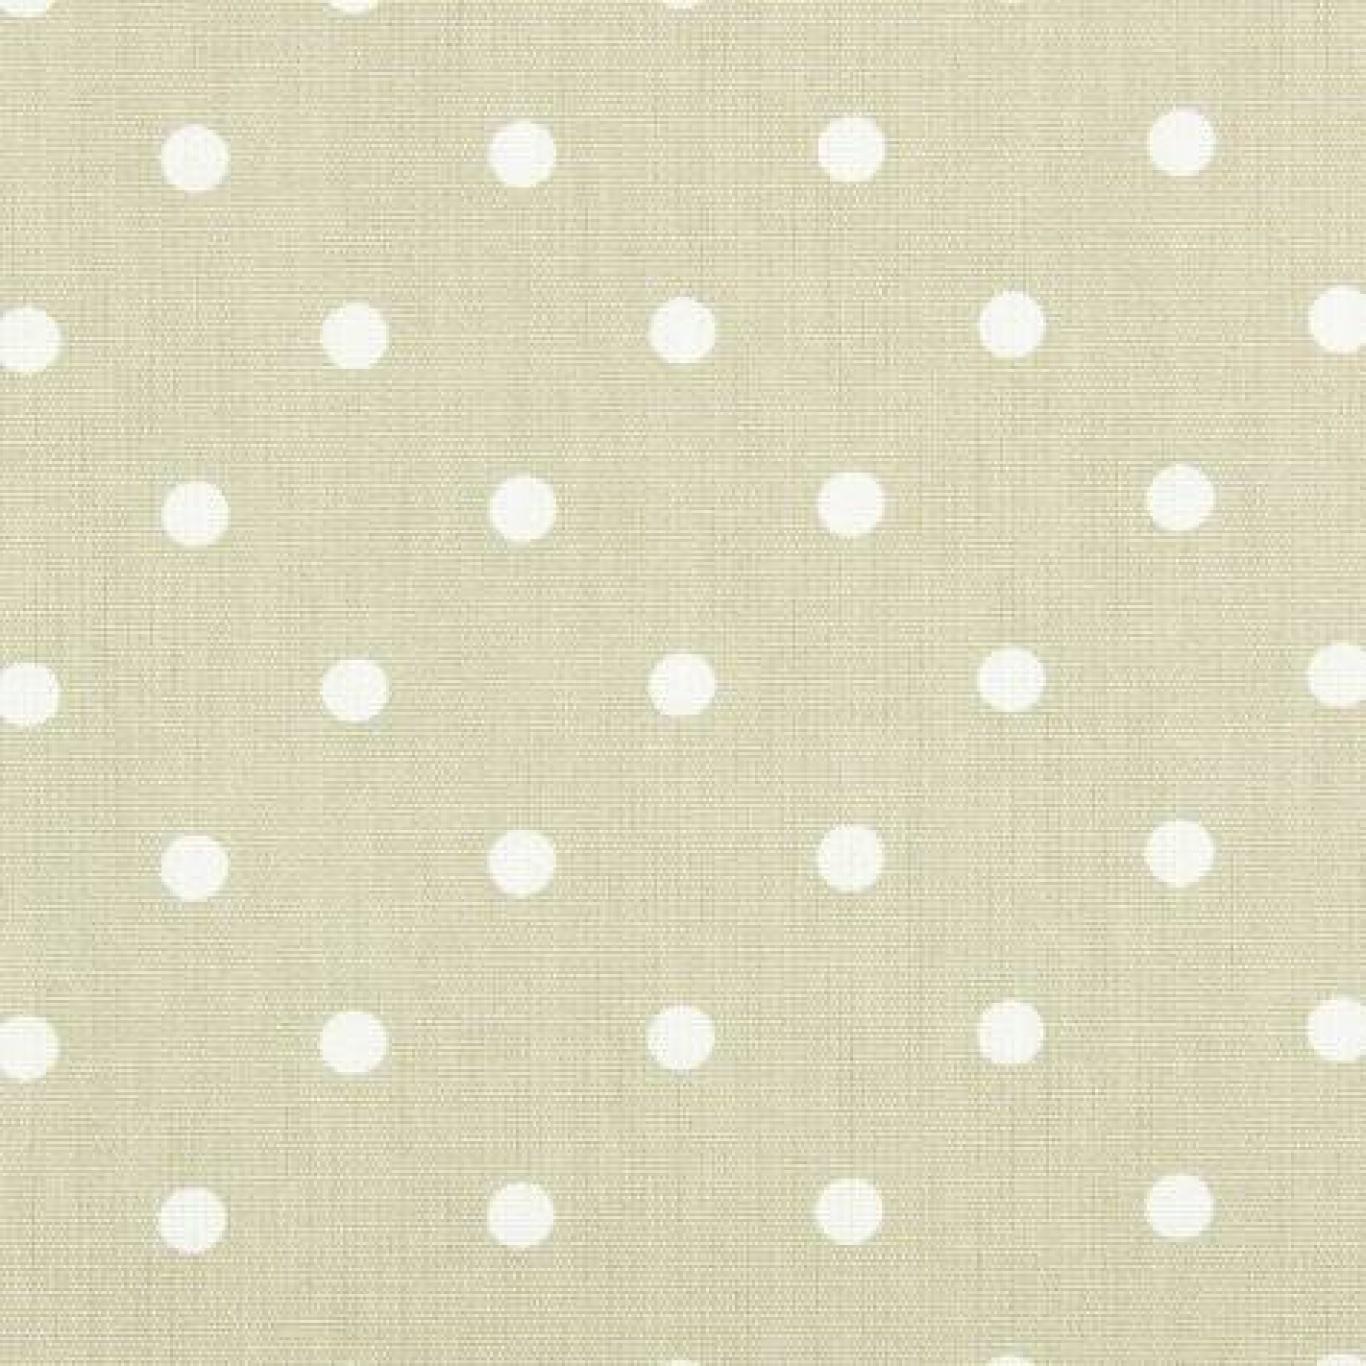 Image of Prestigious Full Stop Parchment Curtain Fabric